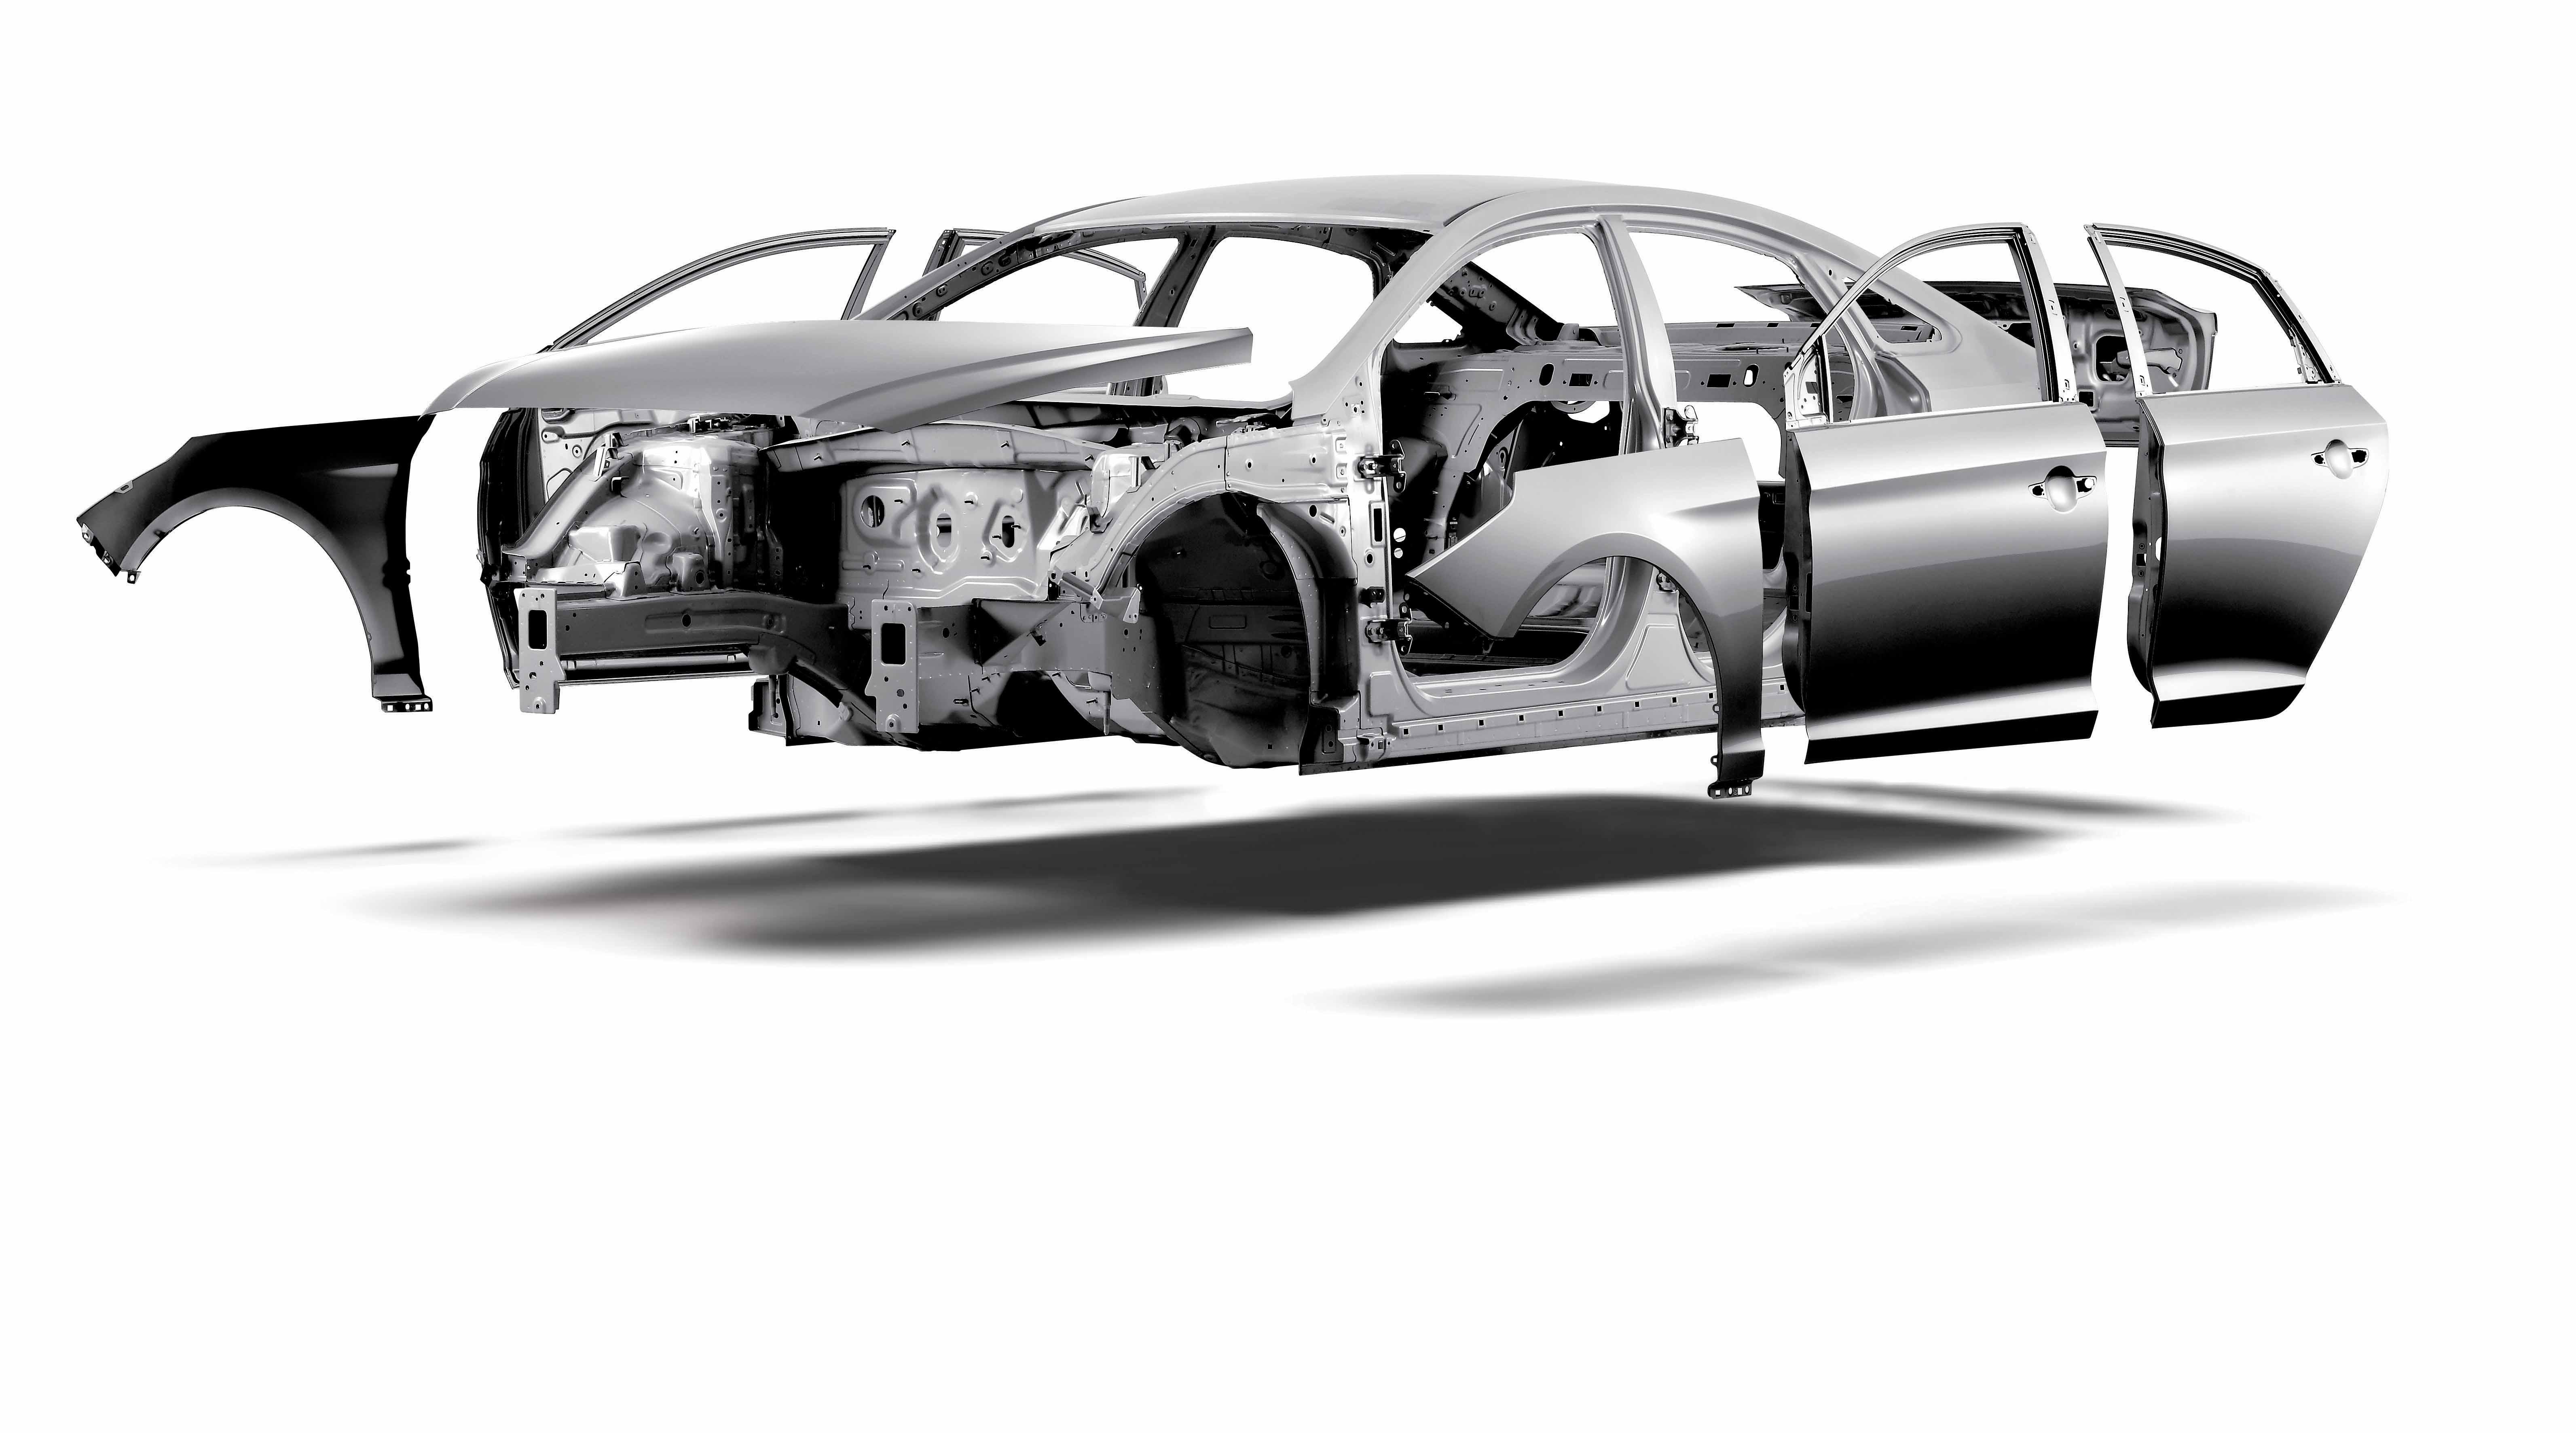 Prächtig Sonata Body in white - Autos.ca #AB_65